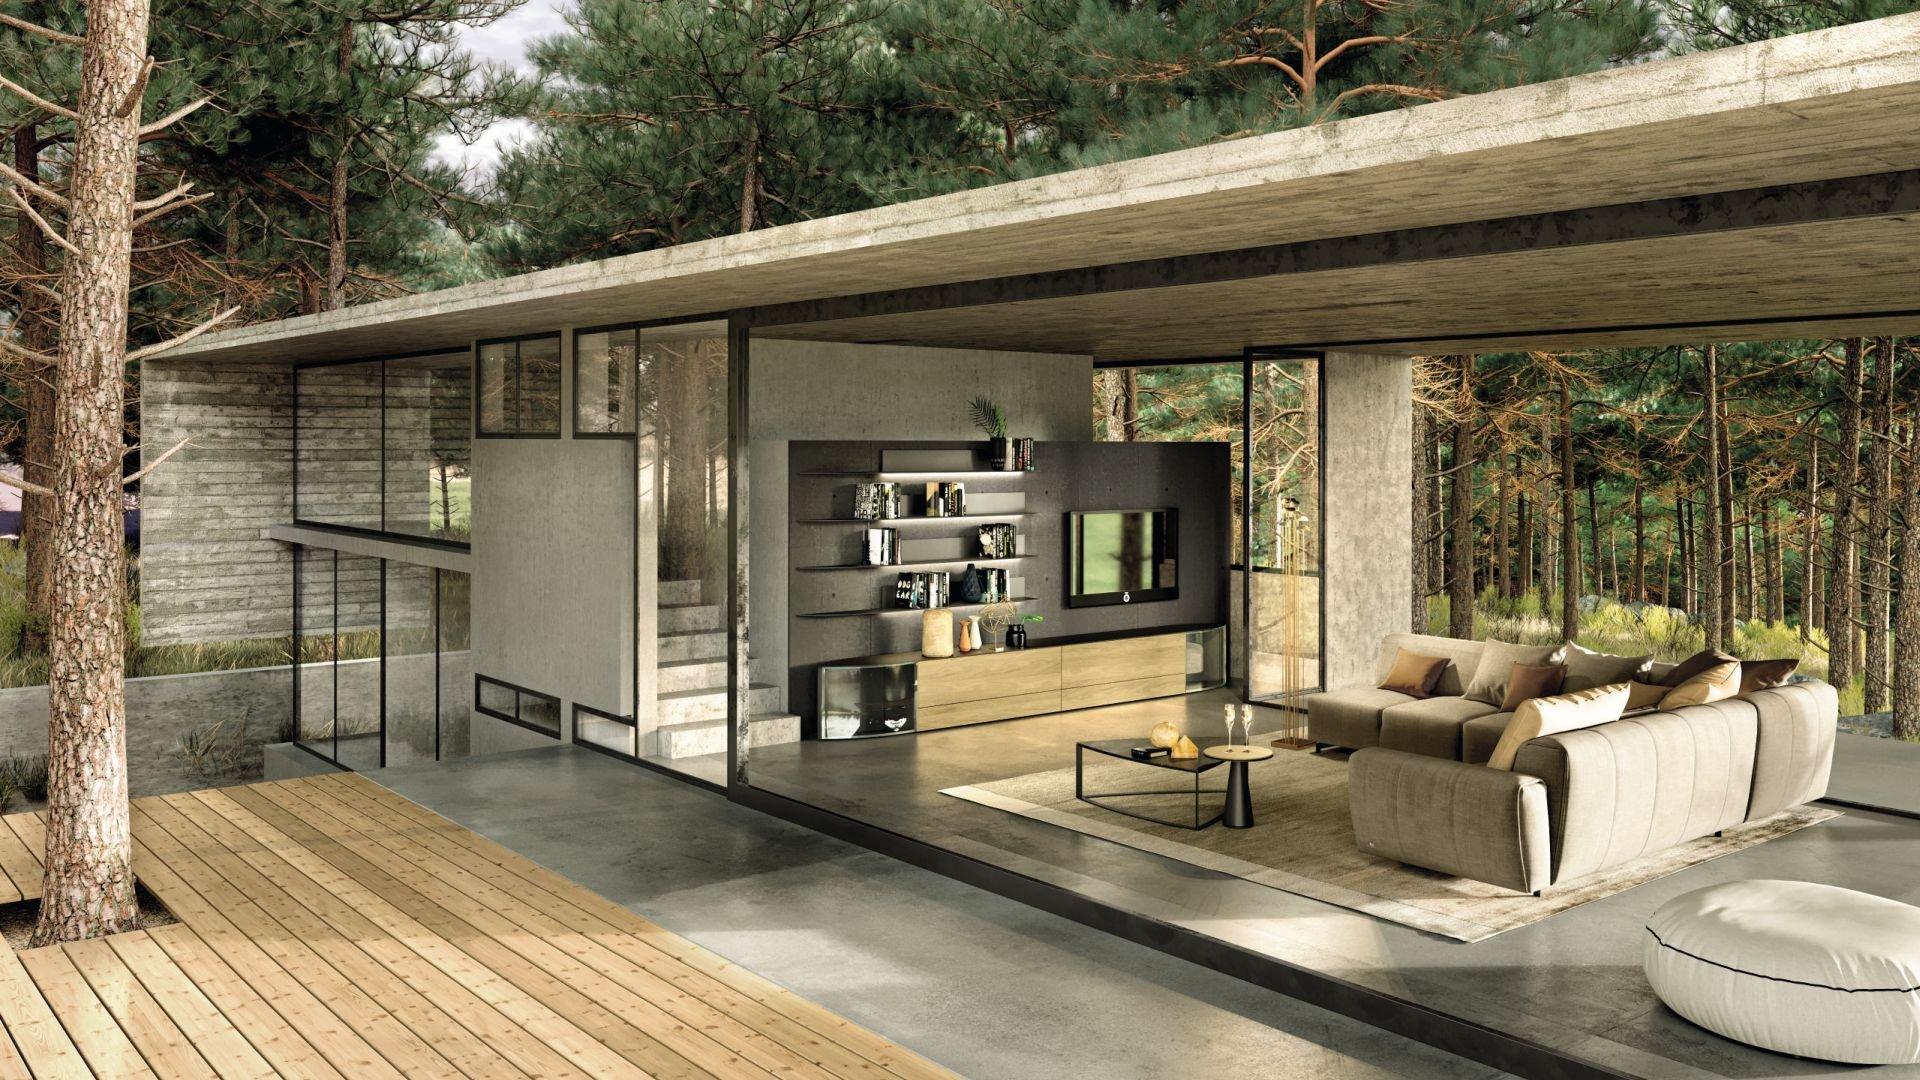 h lsta home style. Black Bedroom Furniture Sets. Home Design Ideas